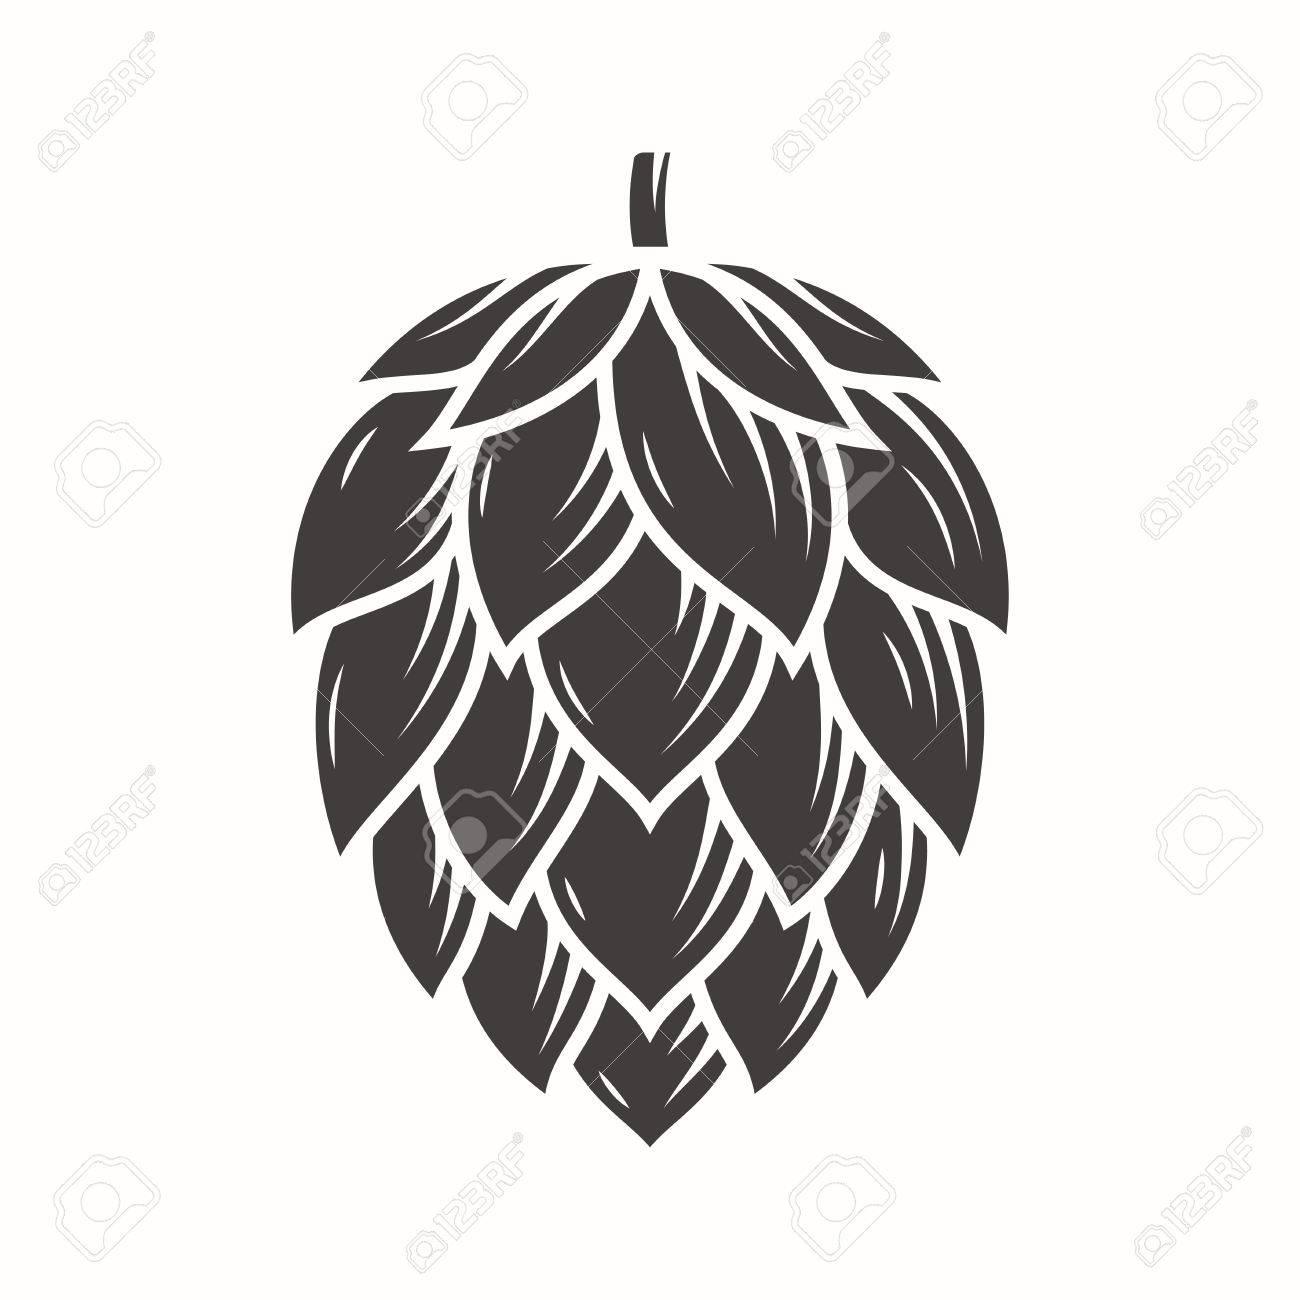 Hop emblem icon label logo. - 80838472